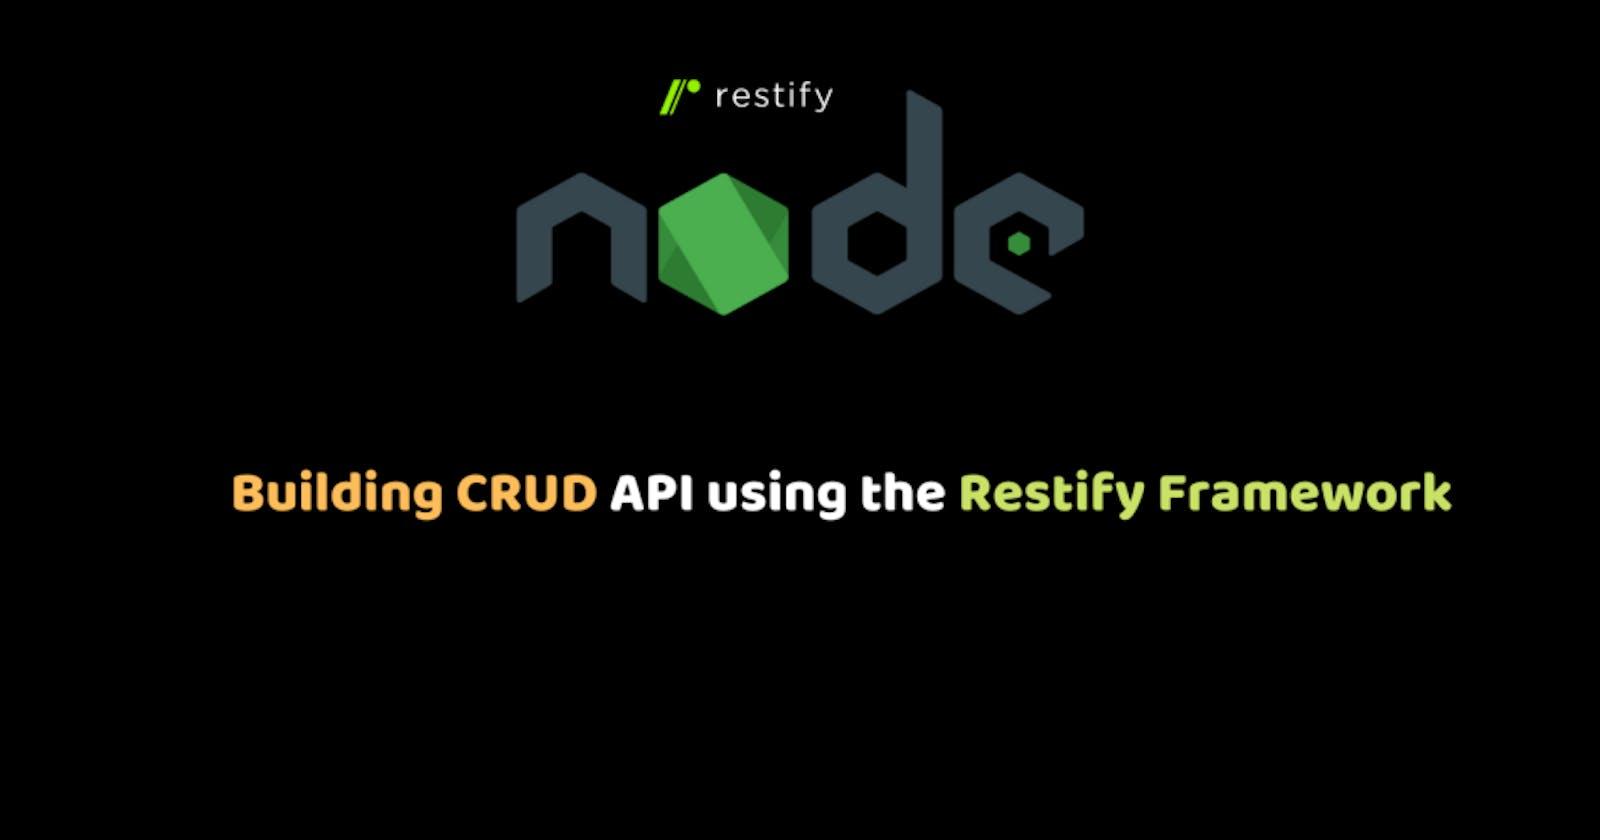 Building CRUD API using Restify Framework